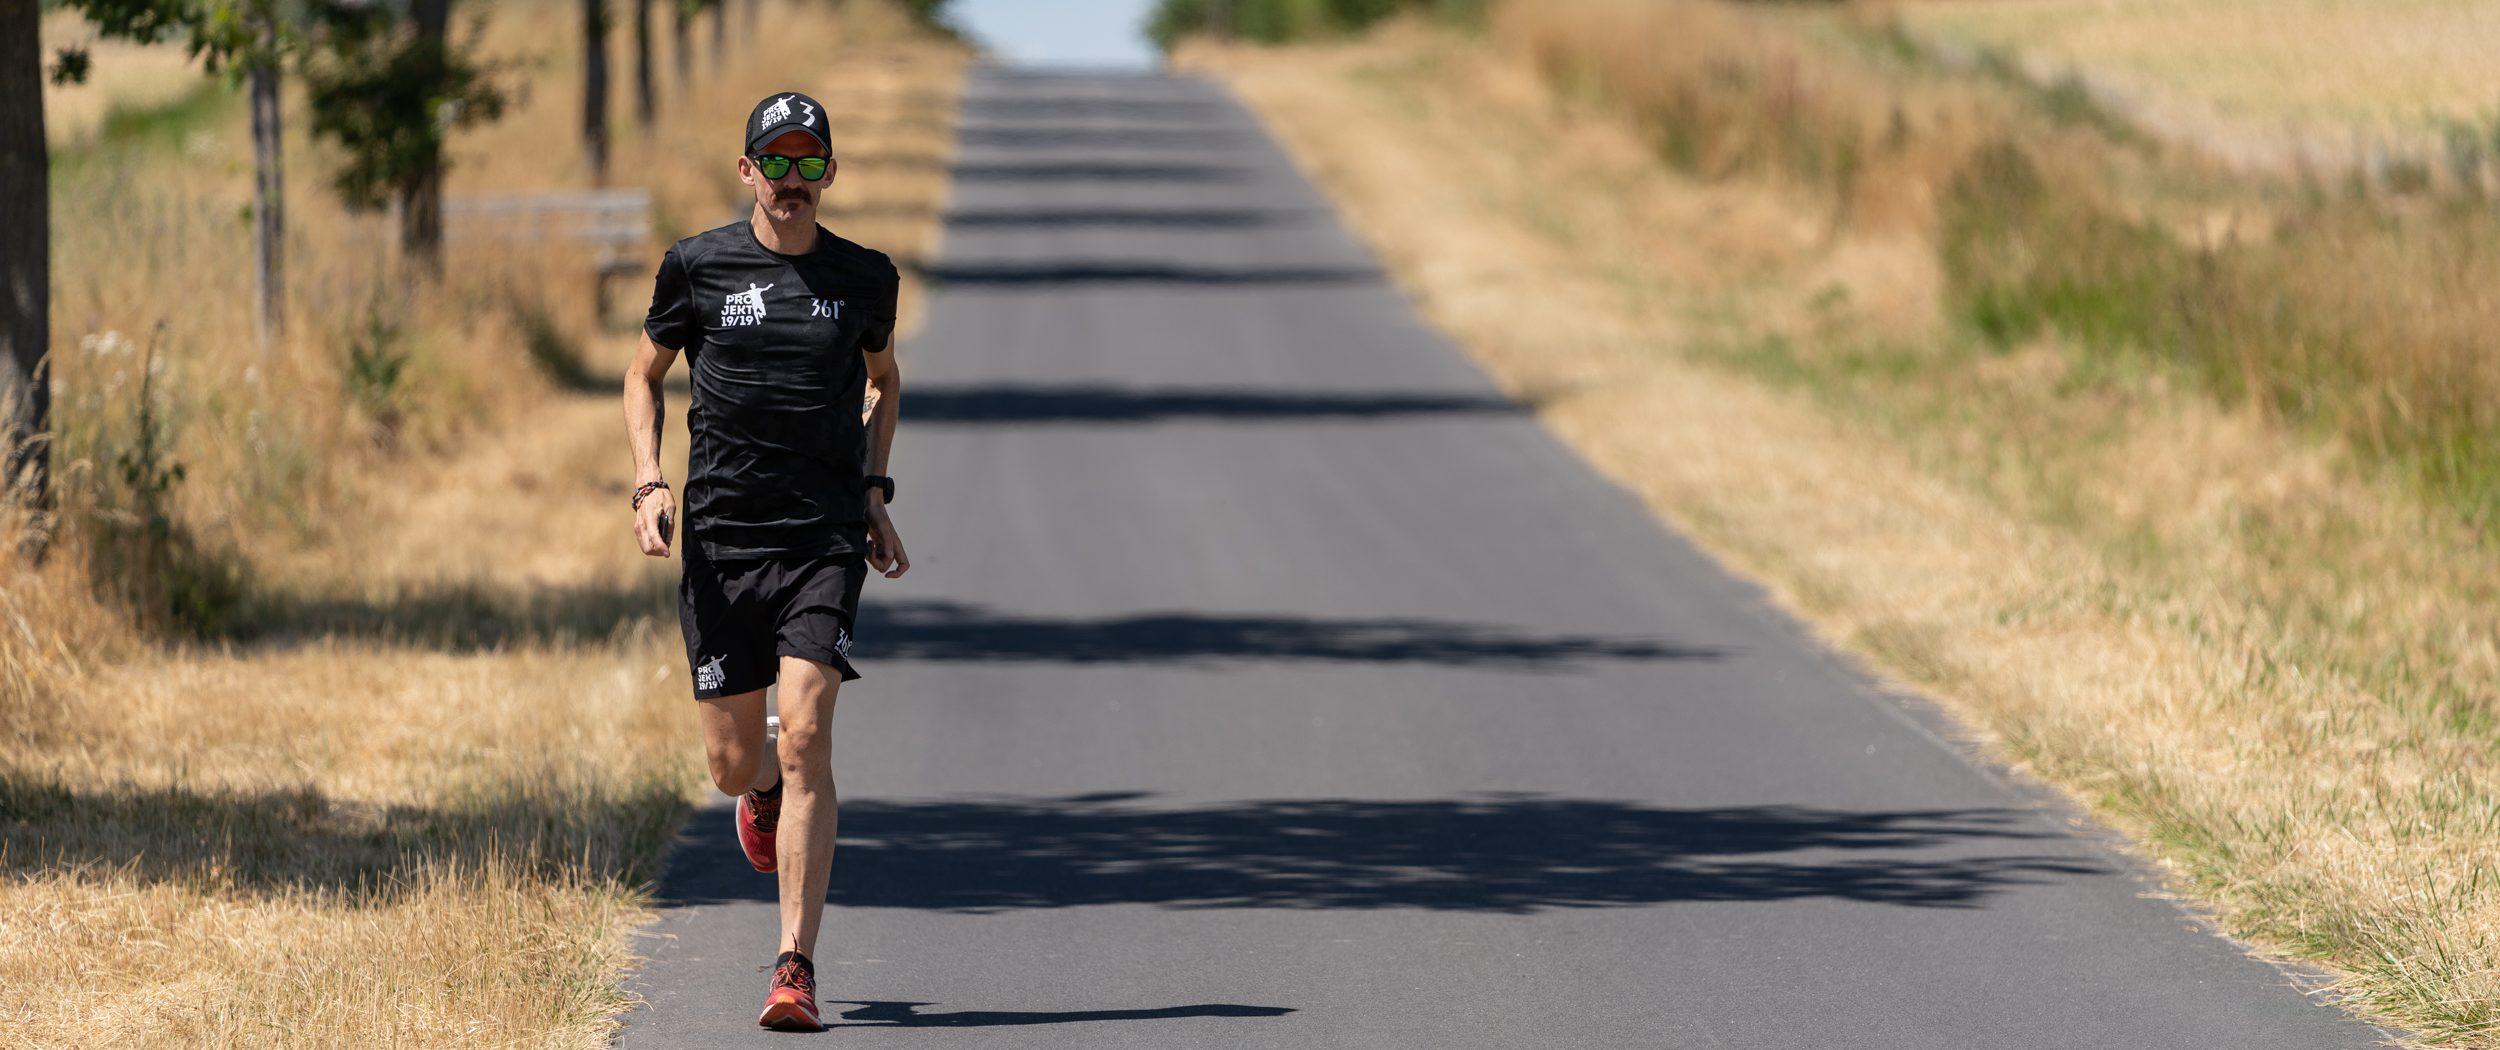 Fatboysrun Episode 181 – Anthony Horyna – 45 Marathons in 45 Tagen